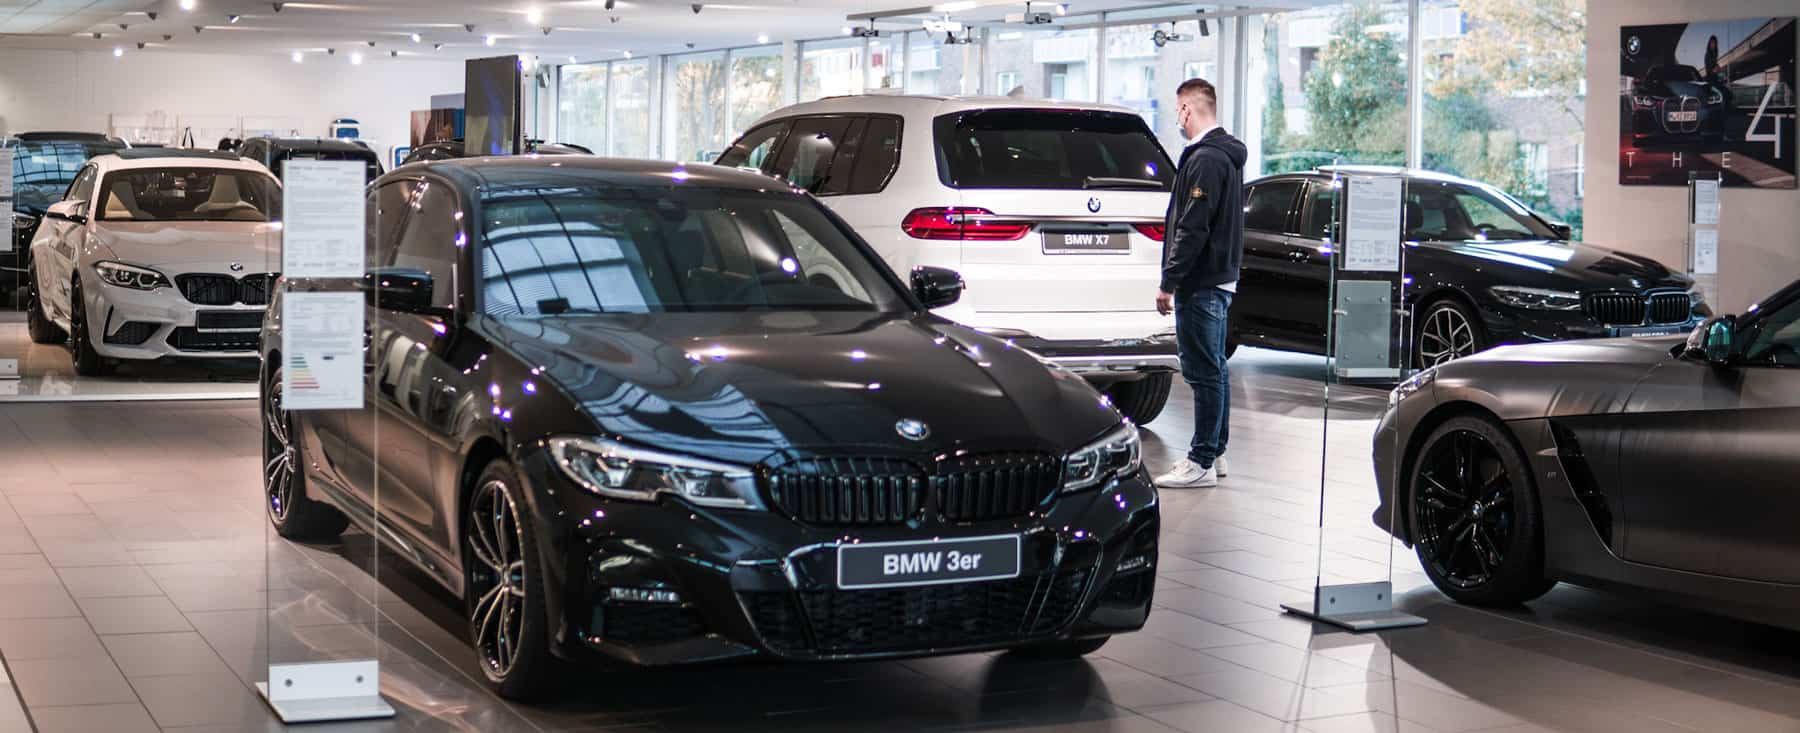 Auto Becker Klausmann geöffnet